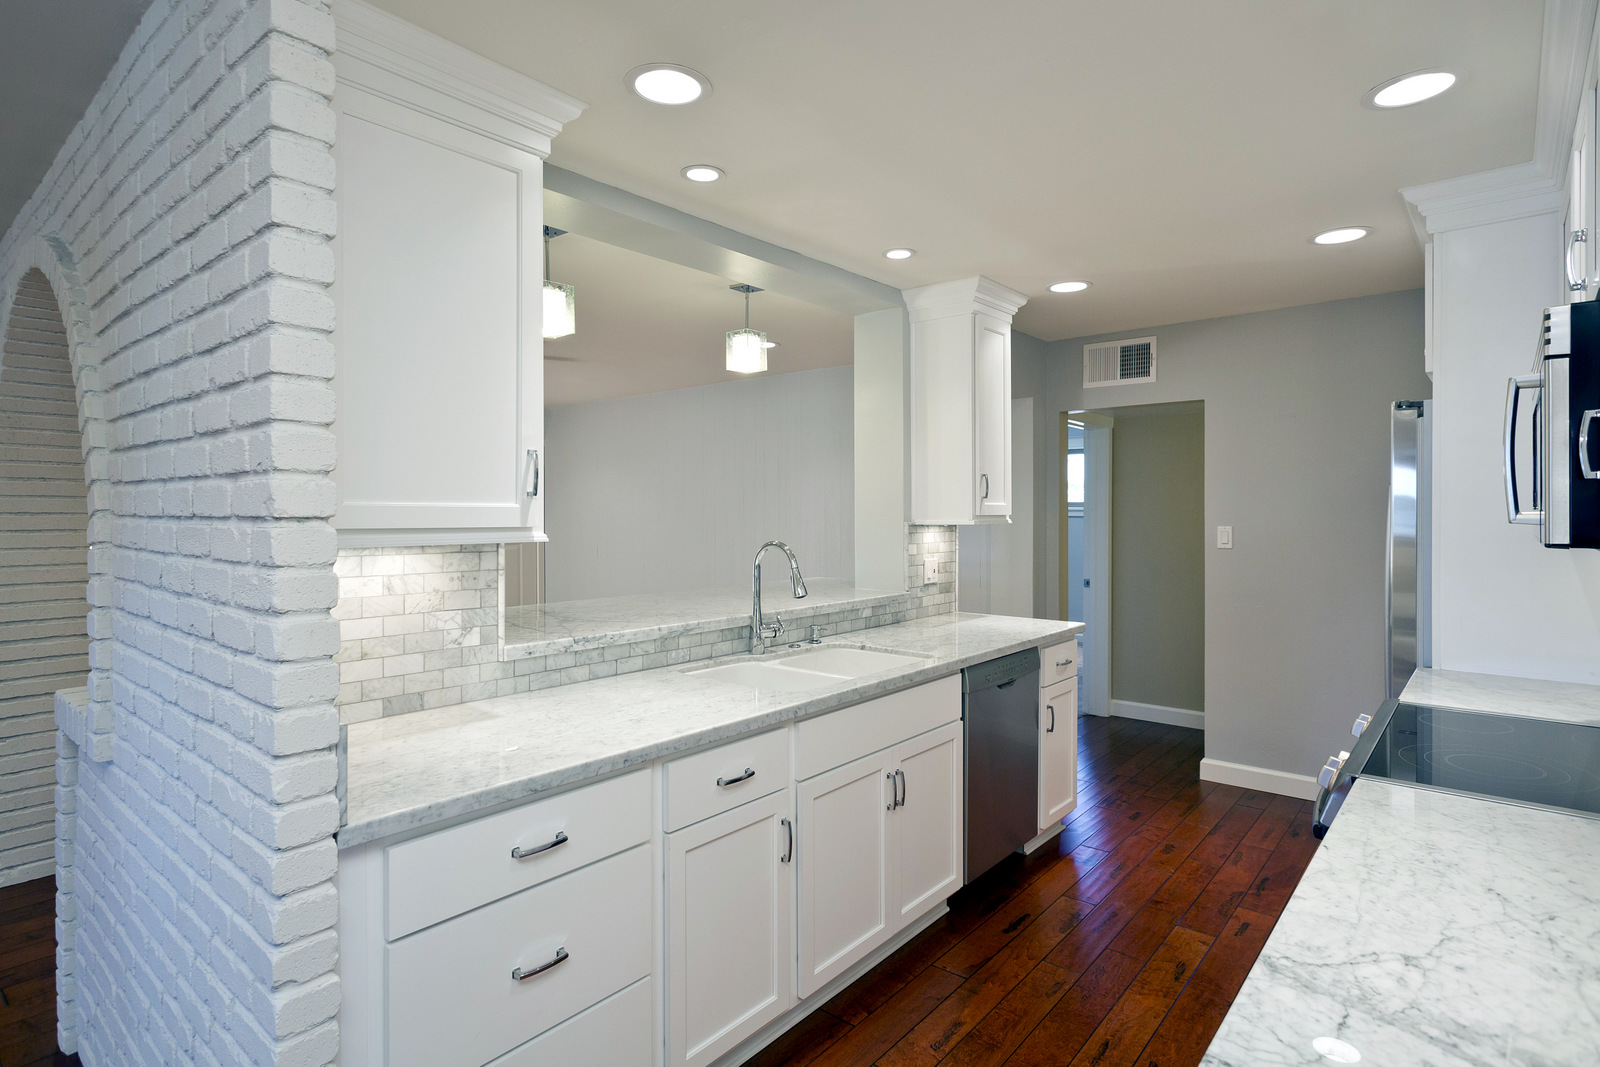 arizona  Phoenix AZ Kitchen and Bathroom Remodeling Contractor